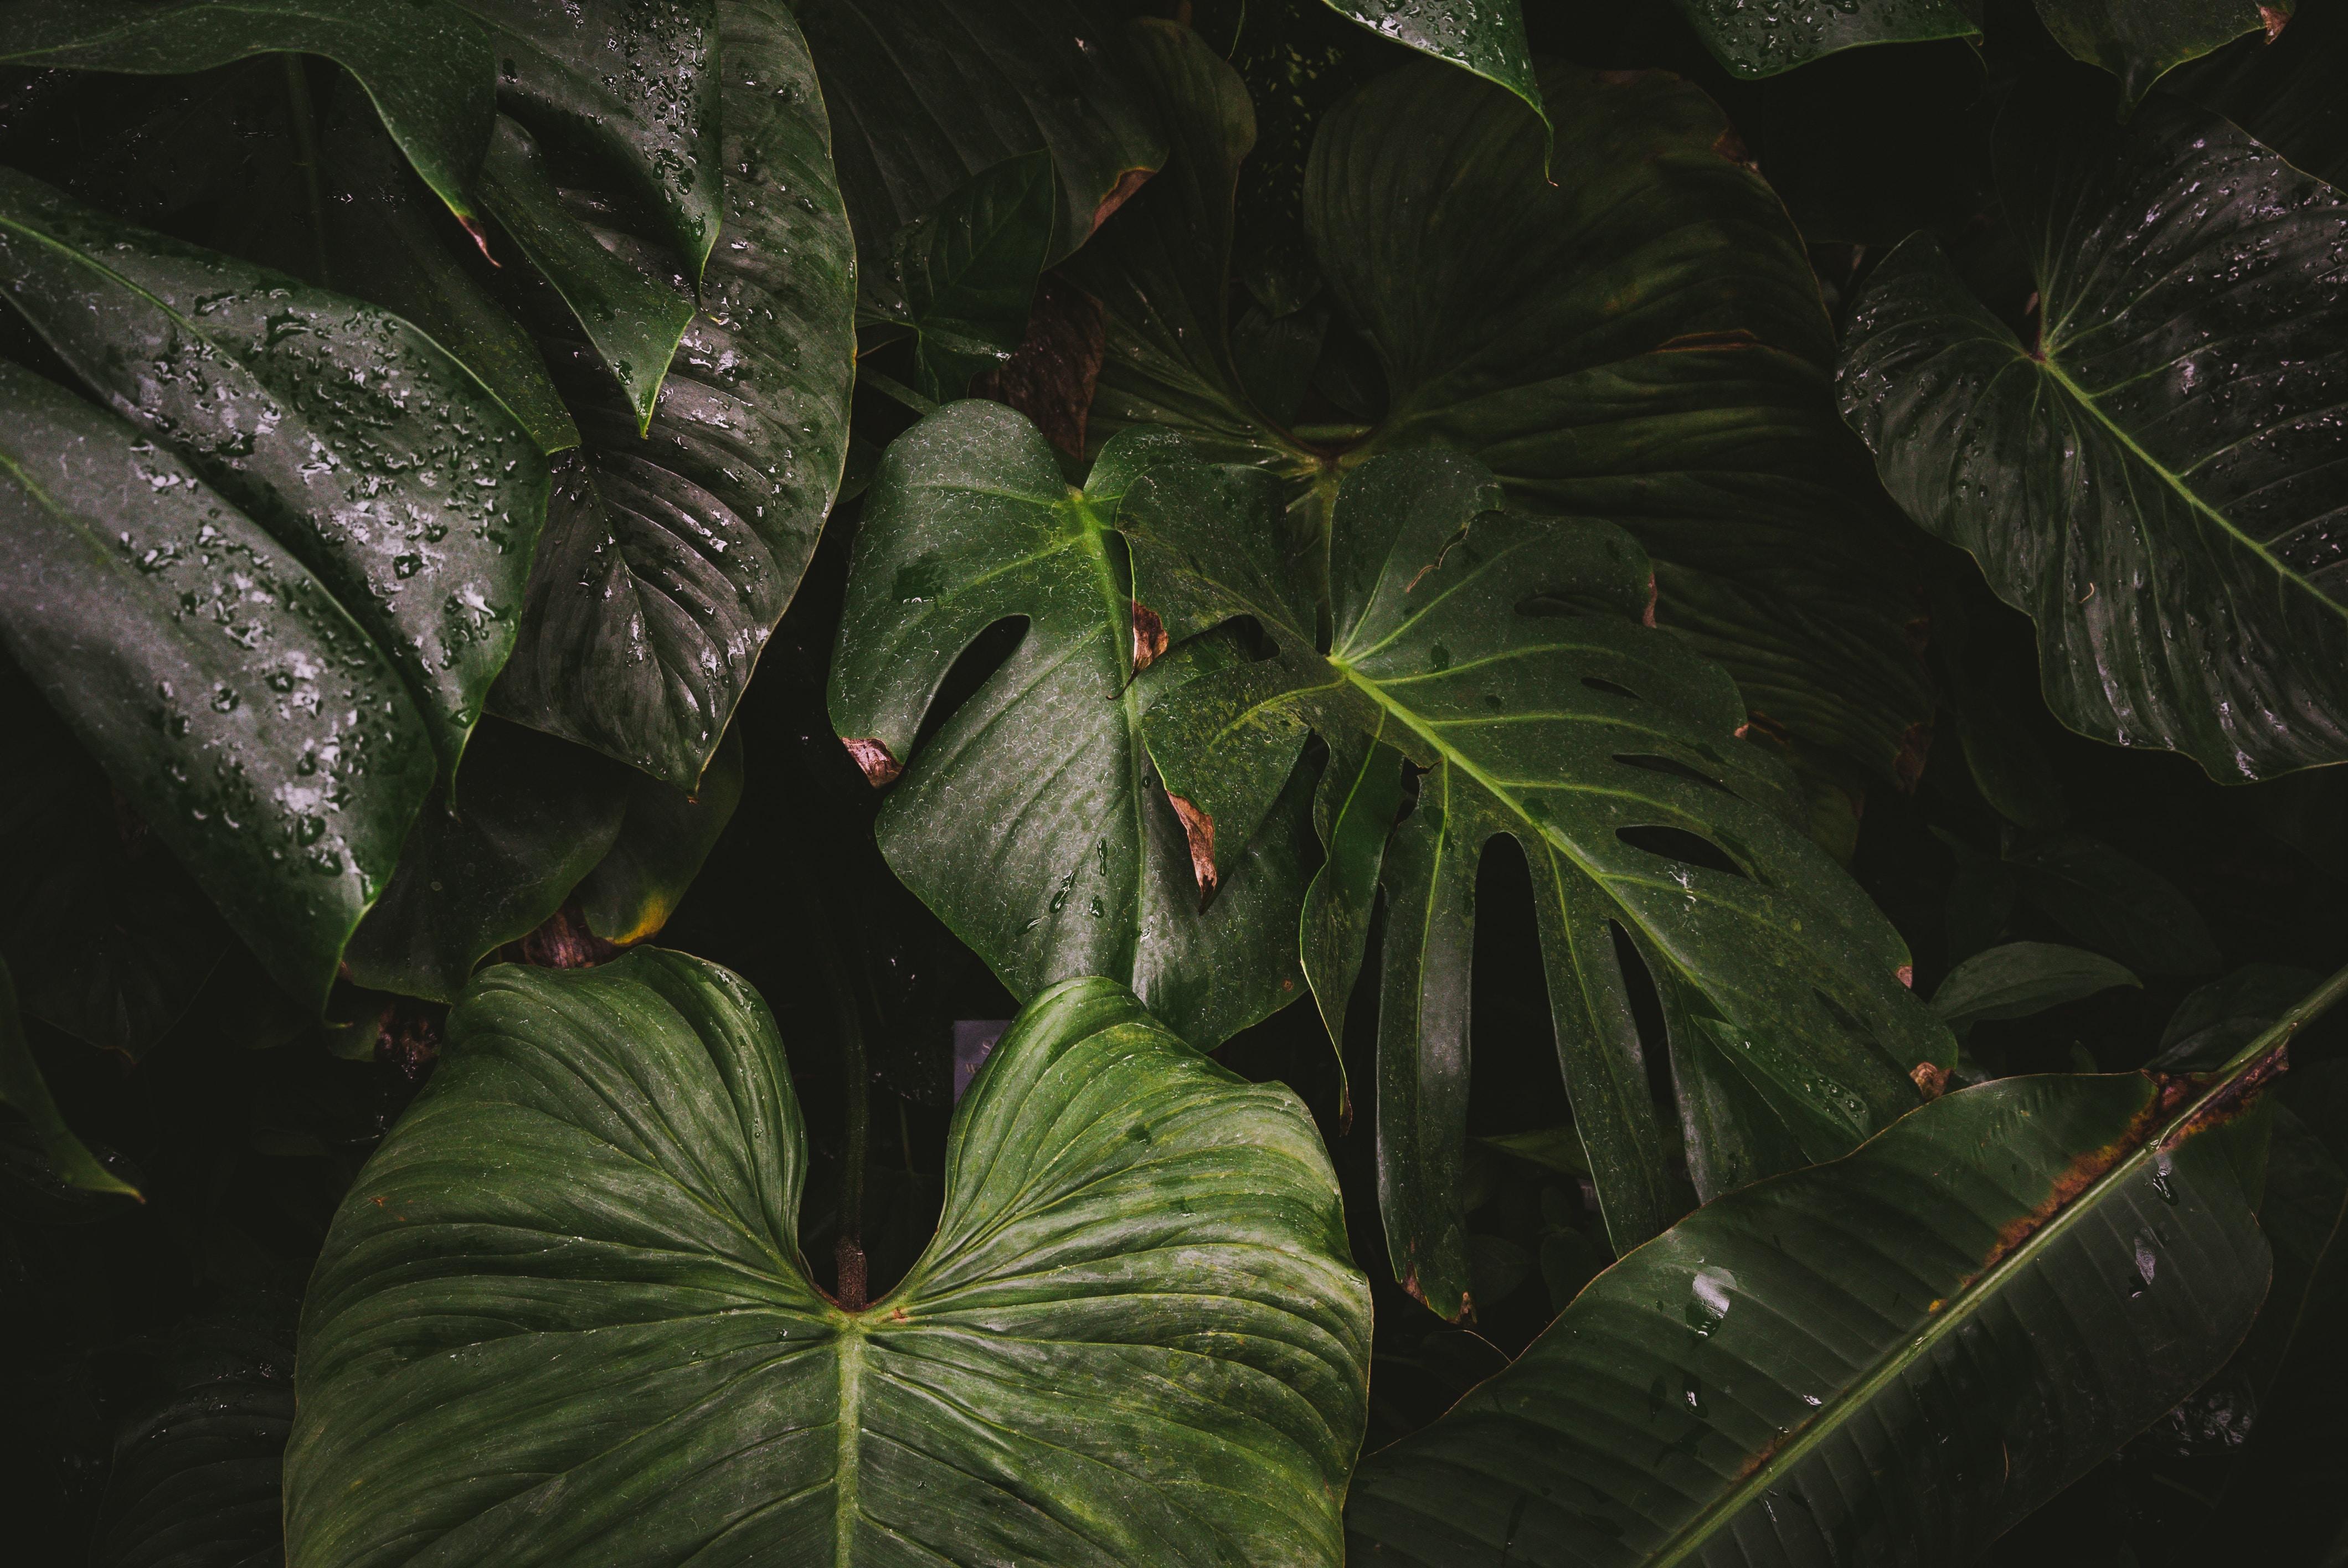 closeup photo of green caladium plant